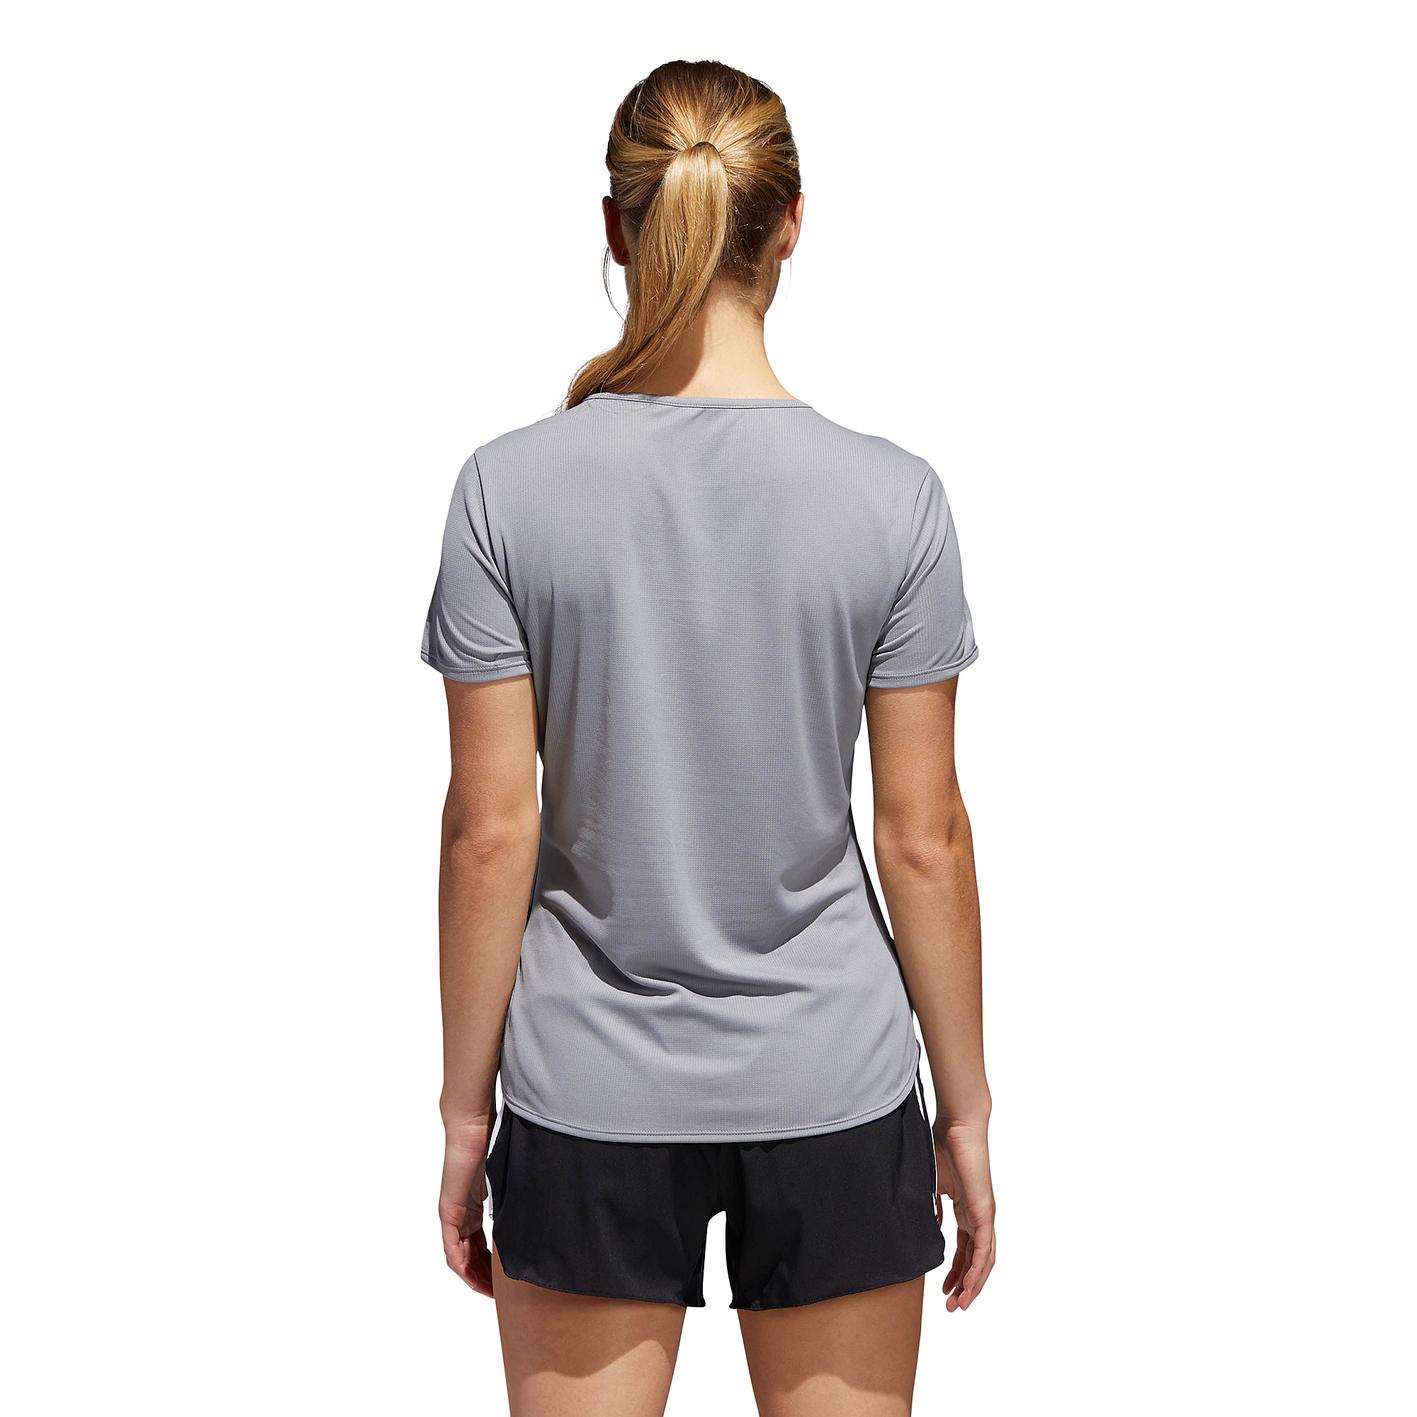 9d36150c317 adidas Response Short Sleeve T-Shirt - Women's - Running - Clothing ...